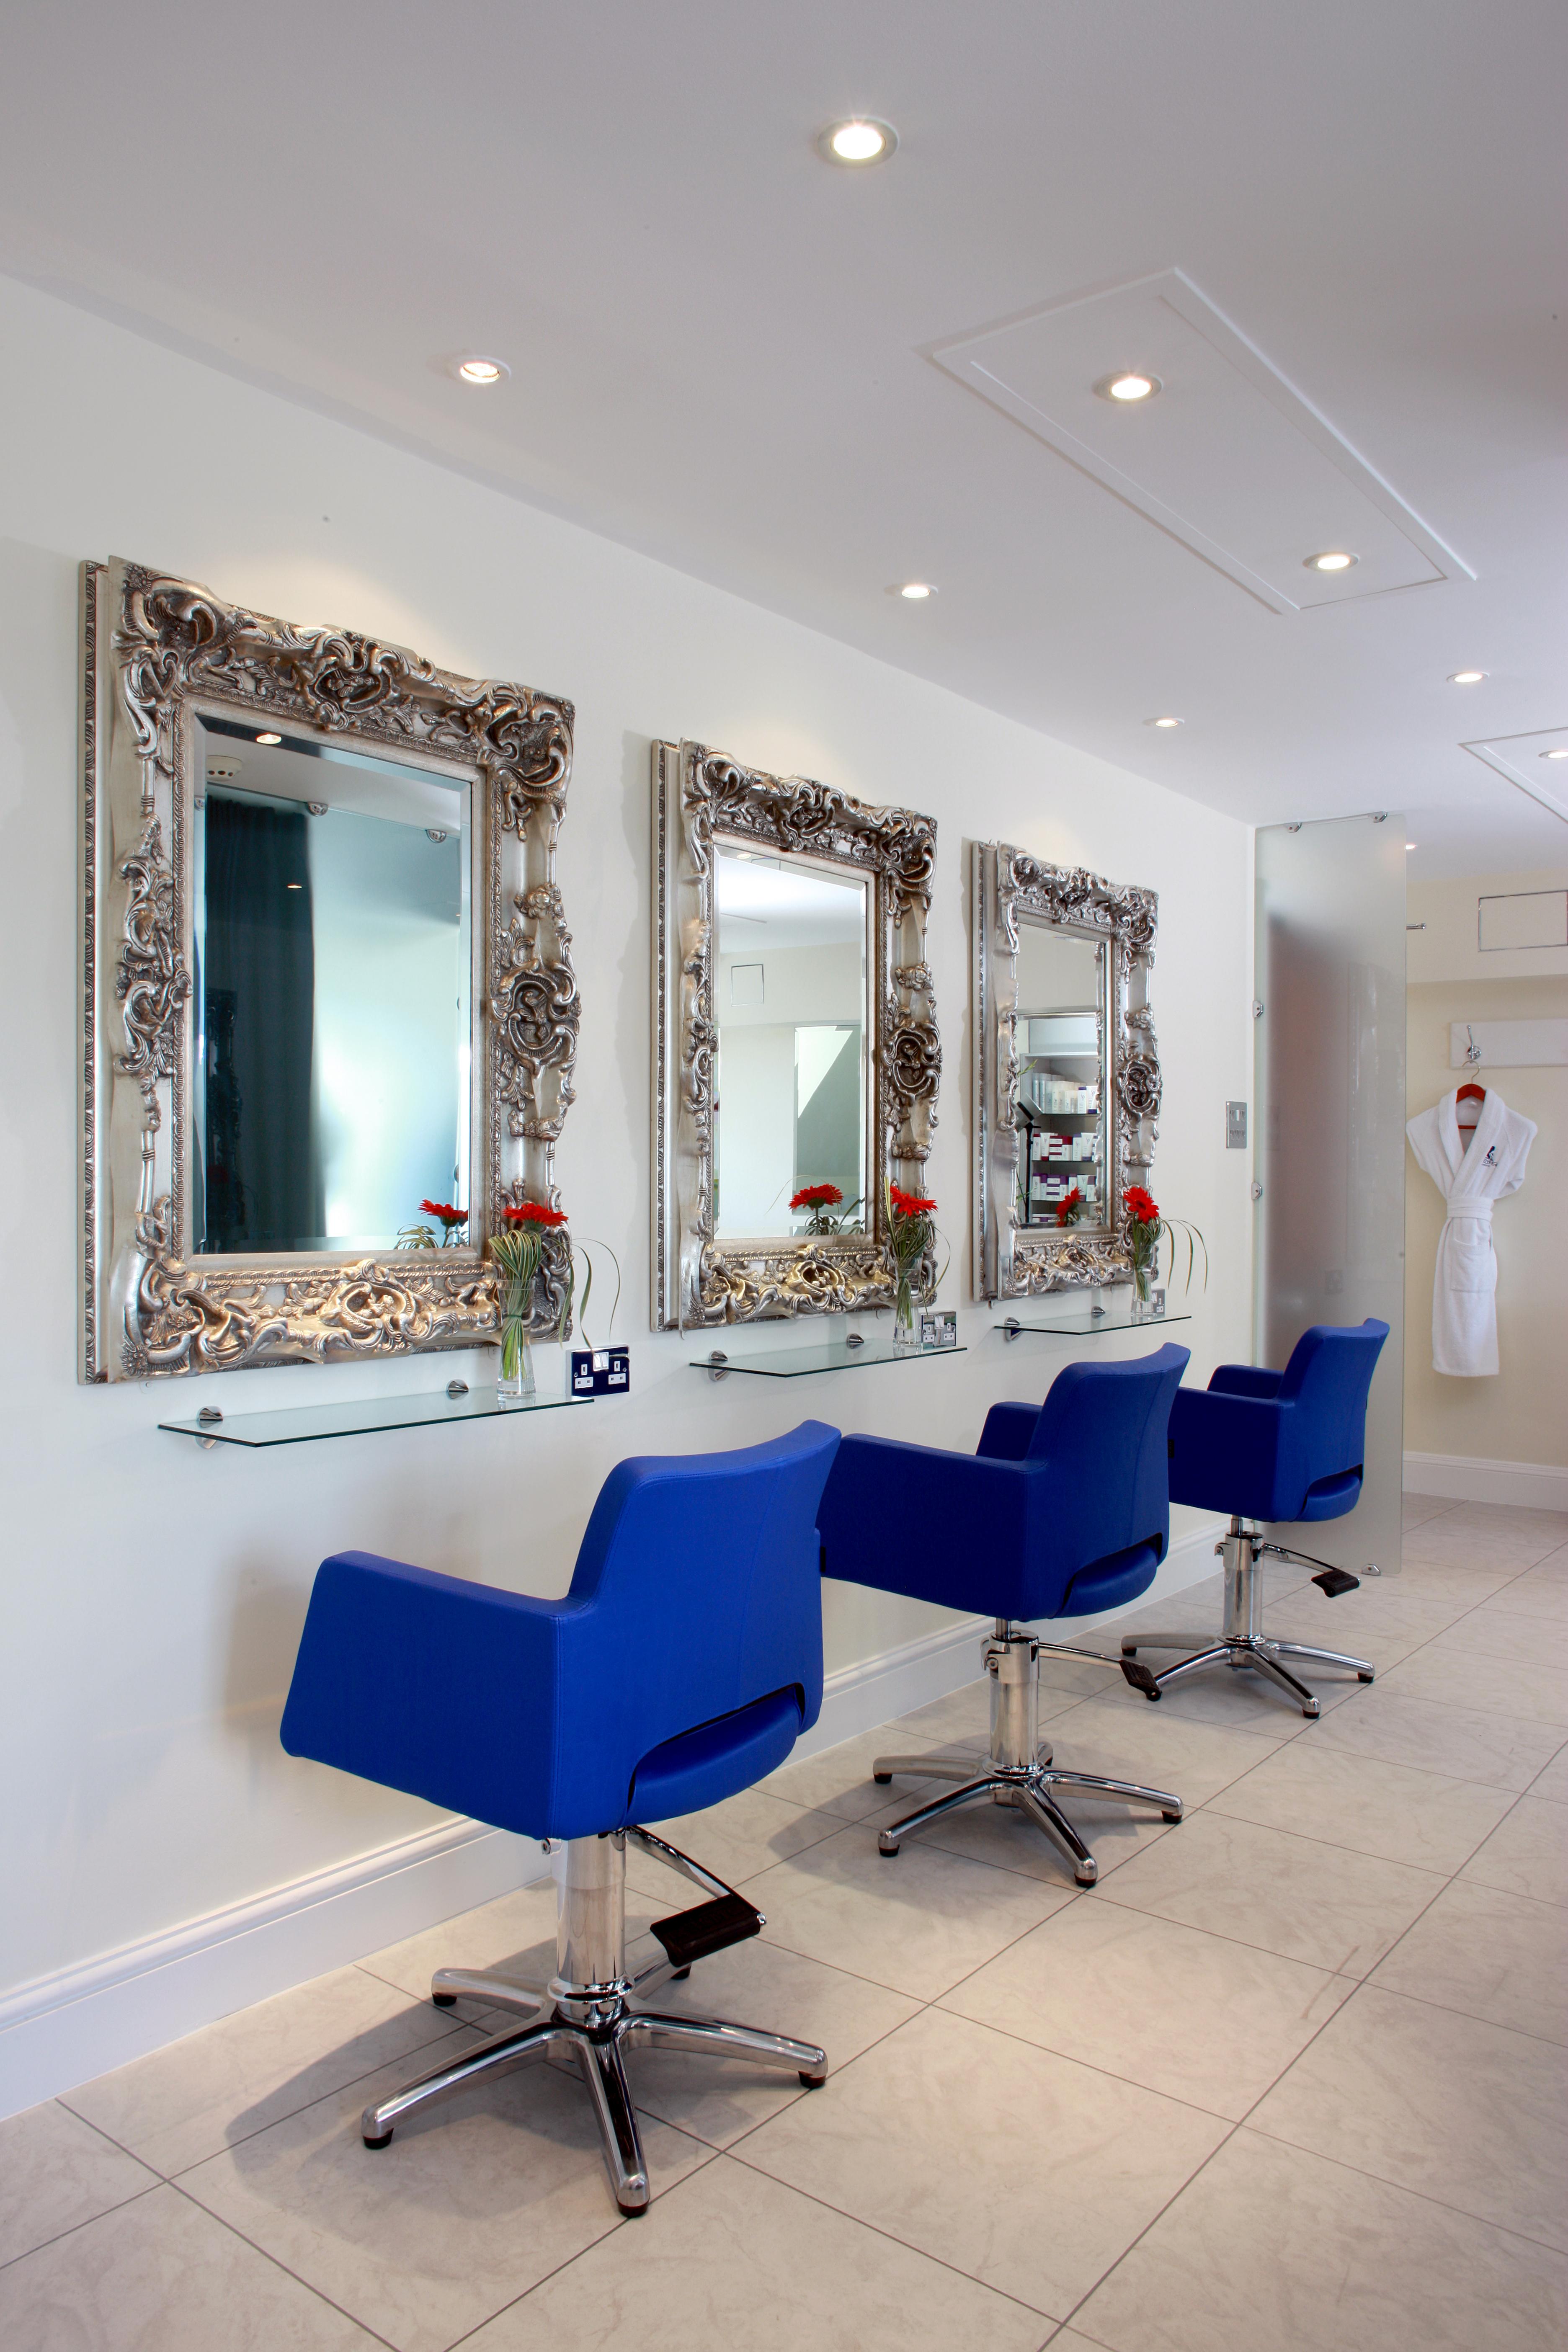 Best manicure london archives page 2 of 3 gentlemans for Best hair salon london